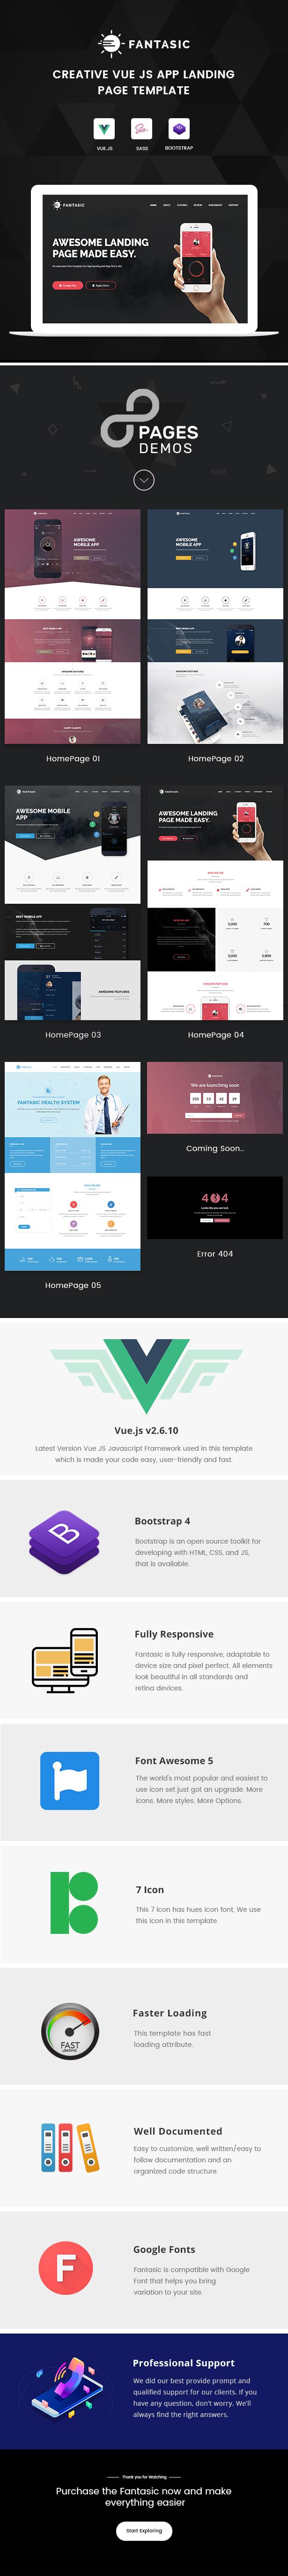 Fantasic - Vue JS App Landing Page Template - 1